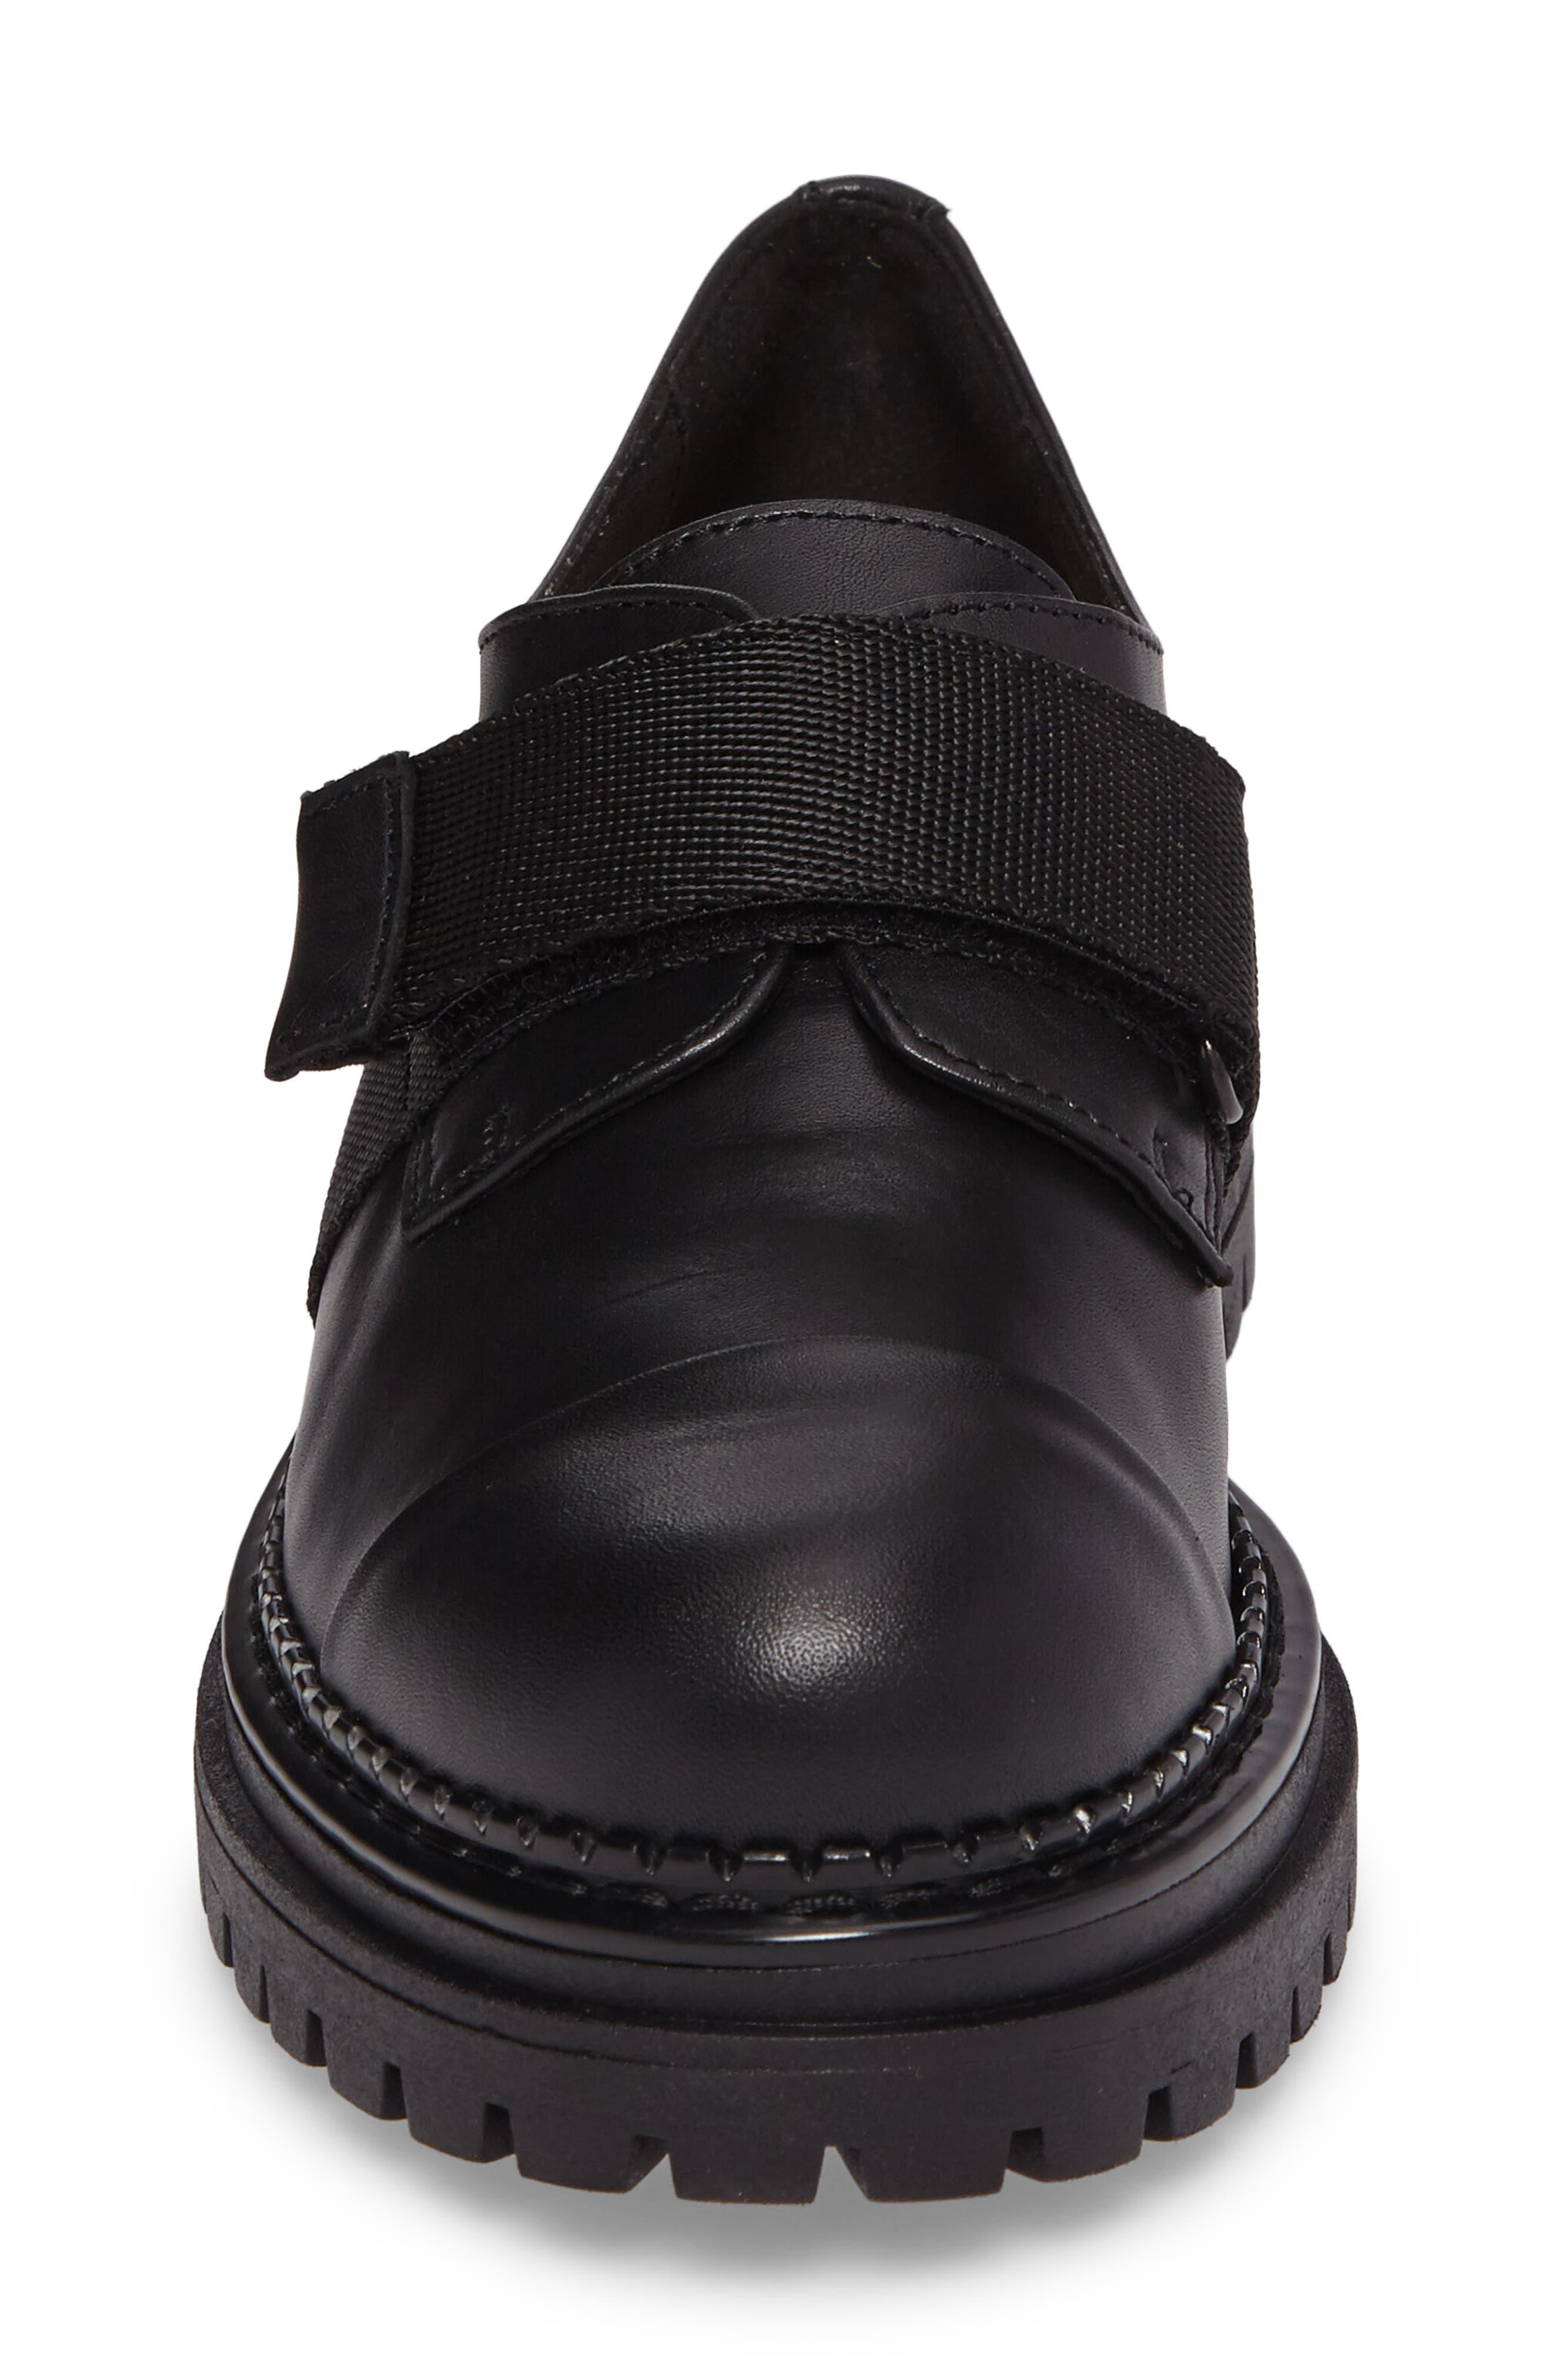 Keeper Lug Sole Loafer,                             Alternate thumbnail 4, color,                             Black